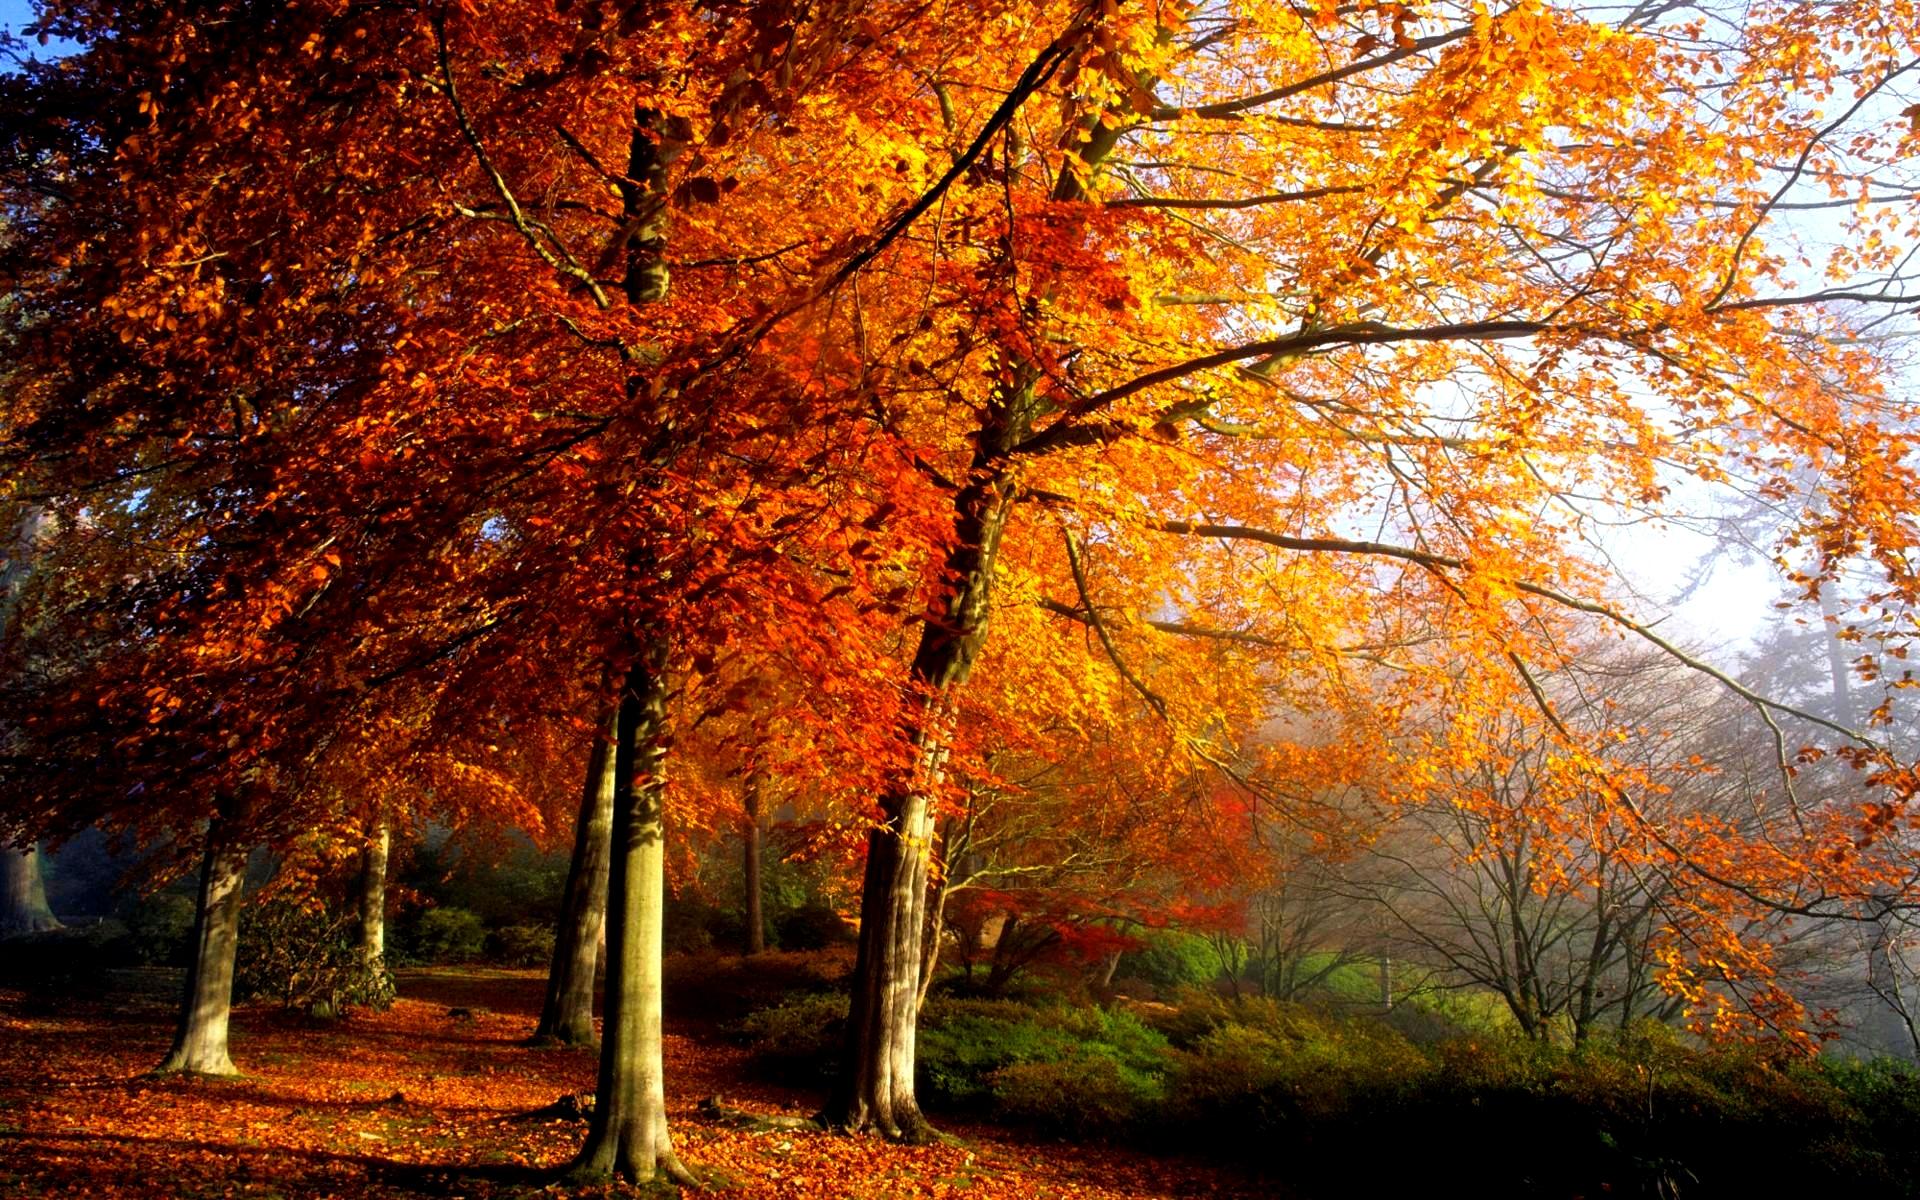 Free Widescreen Wallpaper Fall Autumn Scenery Random Photo 35926731 Fanpop